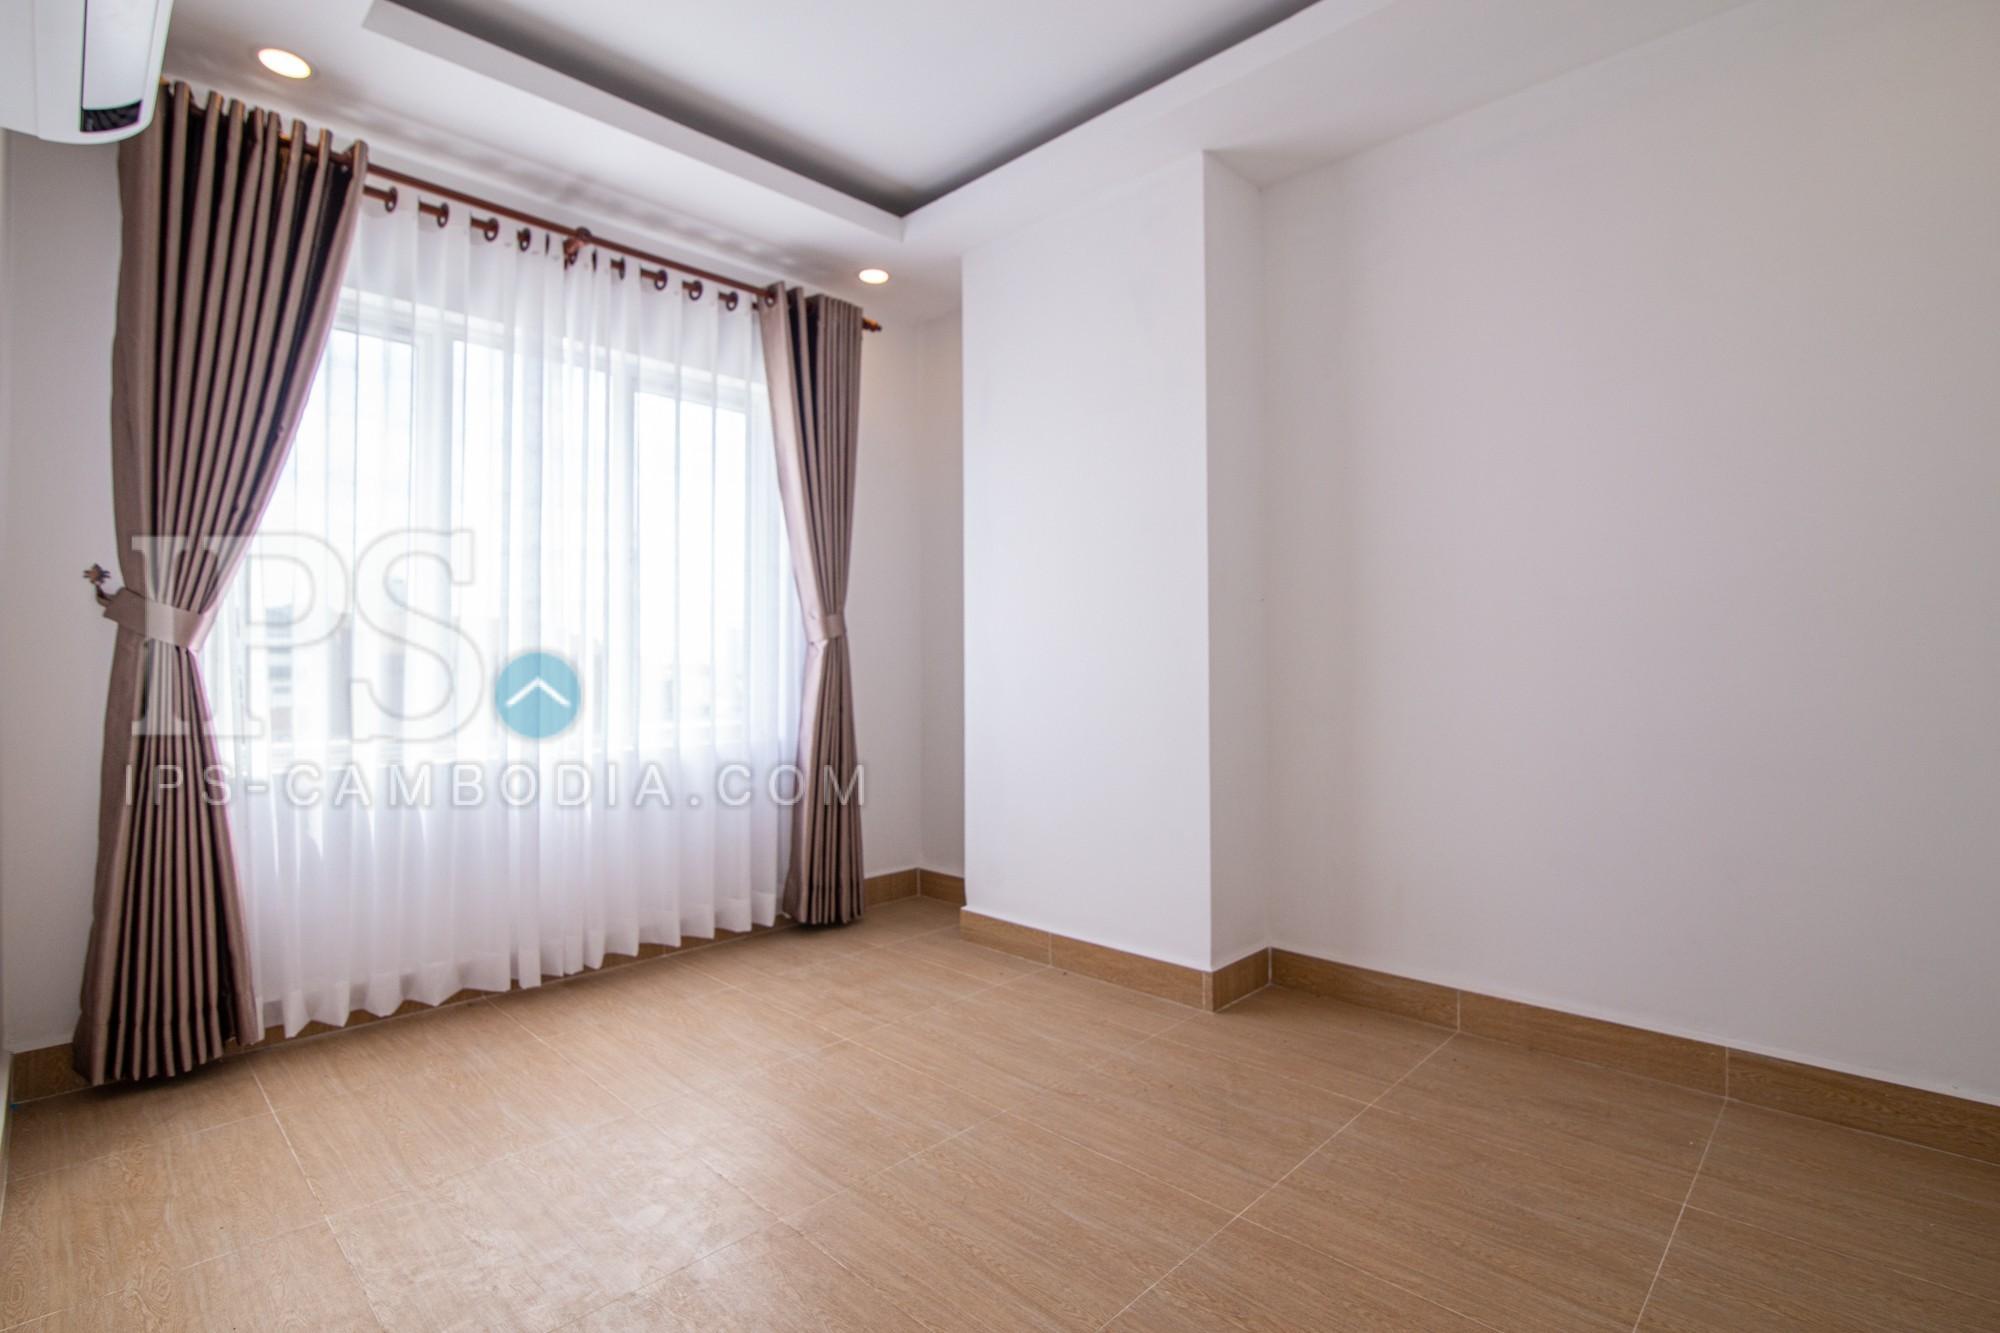 1 Bedroom Condo For Sale - Boeung Keng Kang 3, Chamkarmorn, Phnom Penh